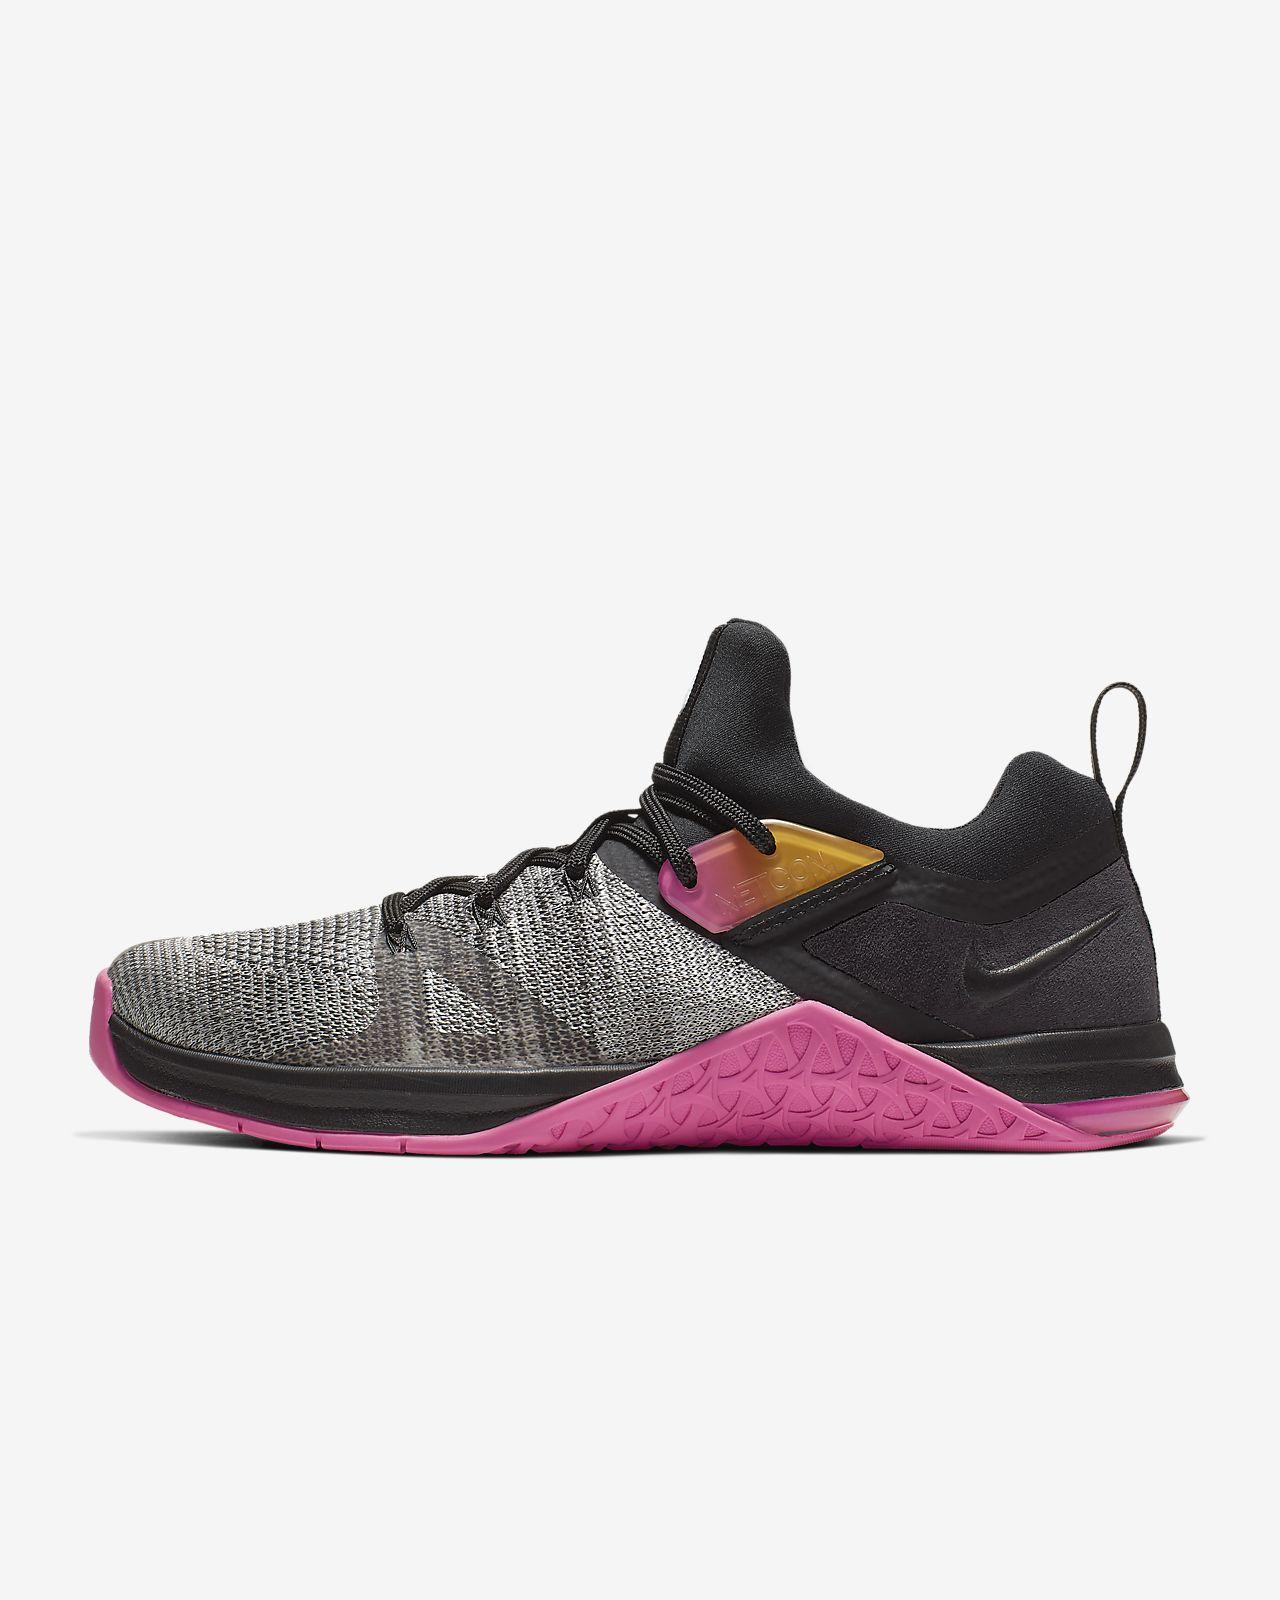 5c79ef5660b Nike Metcon Flyknit 3 Women s Cross-Training Weightlifting Shoe ...